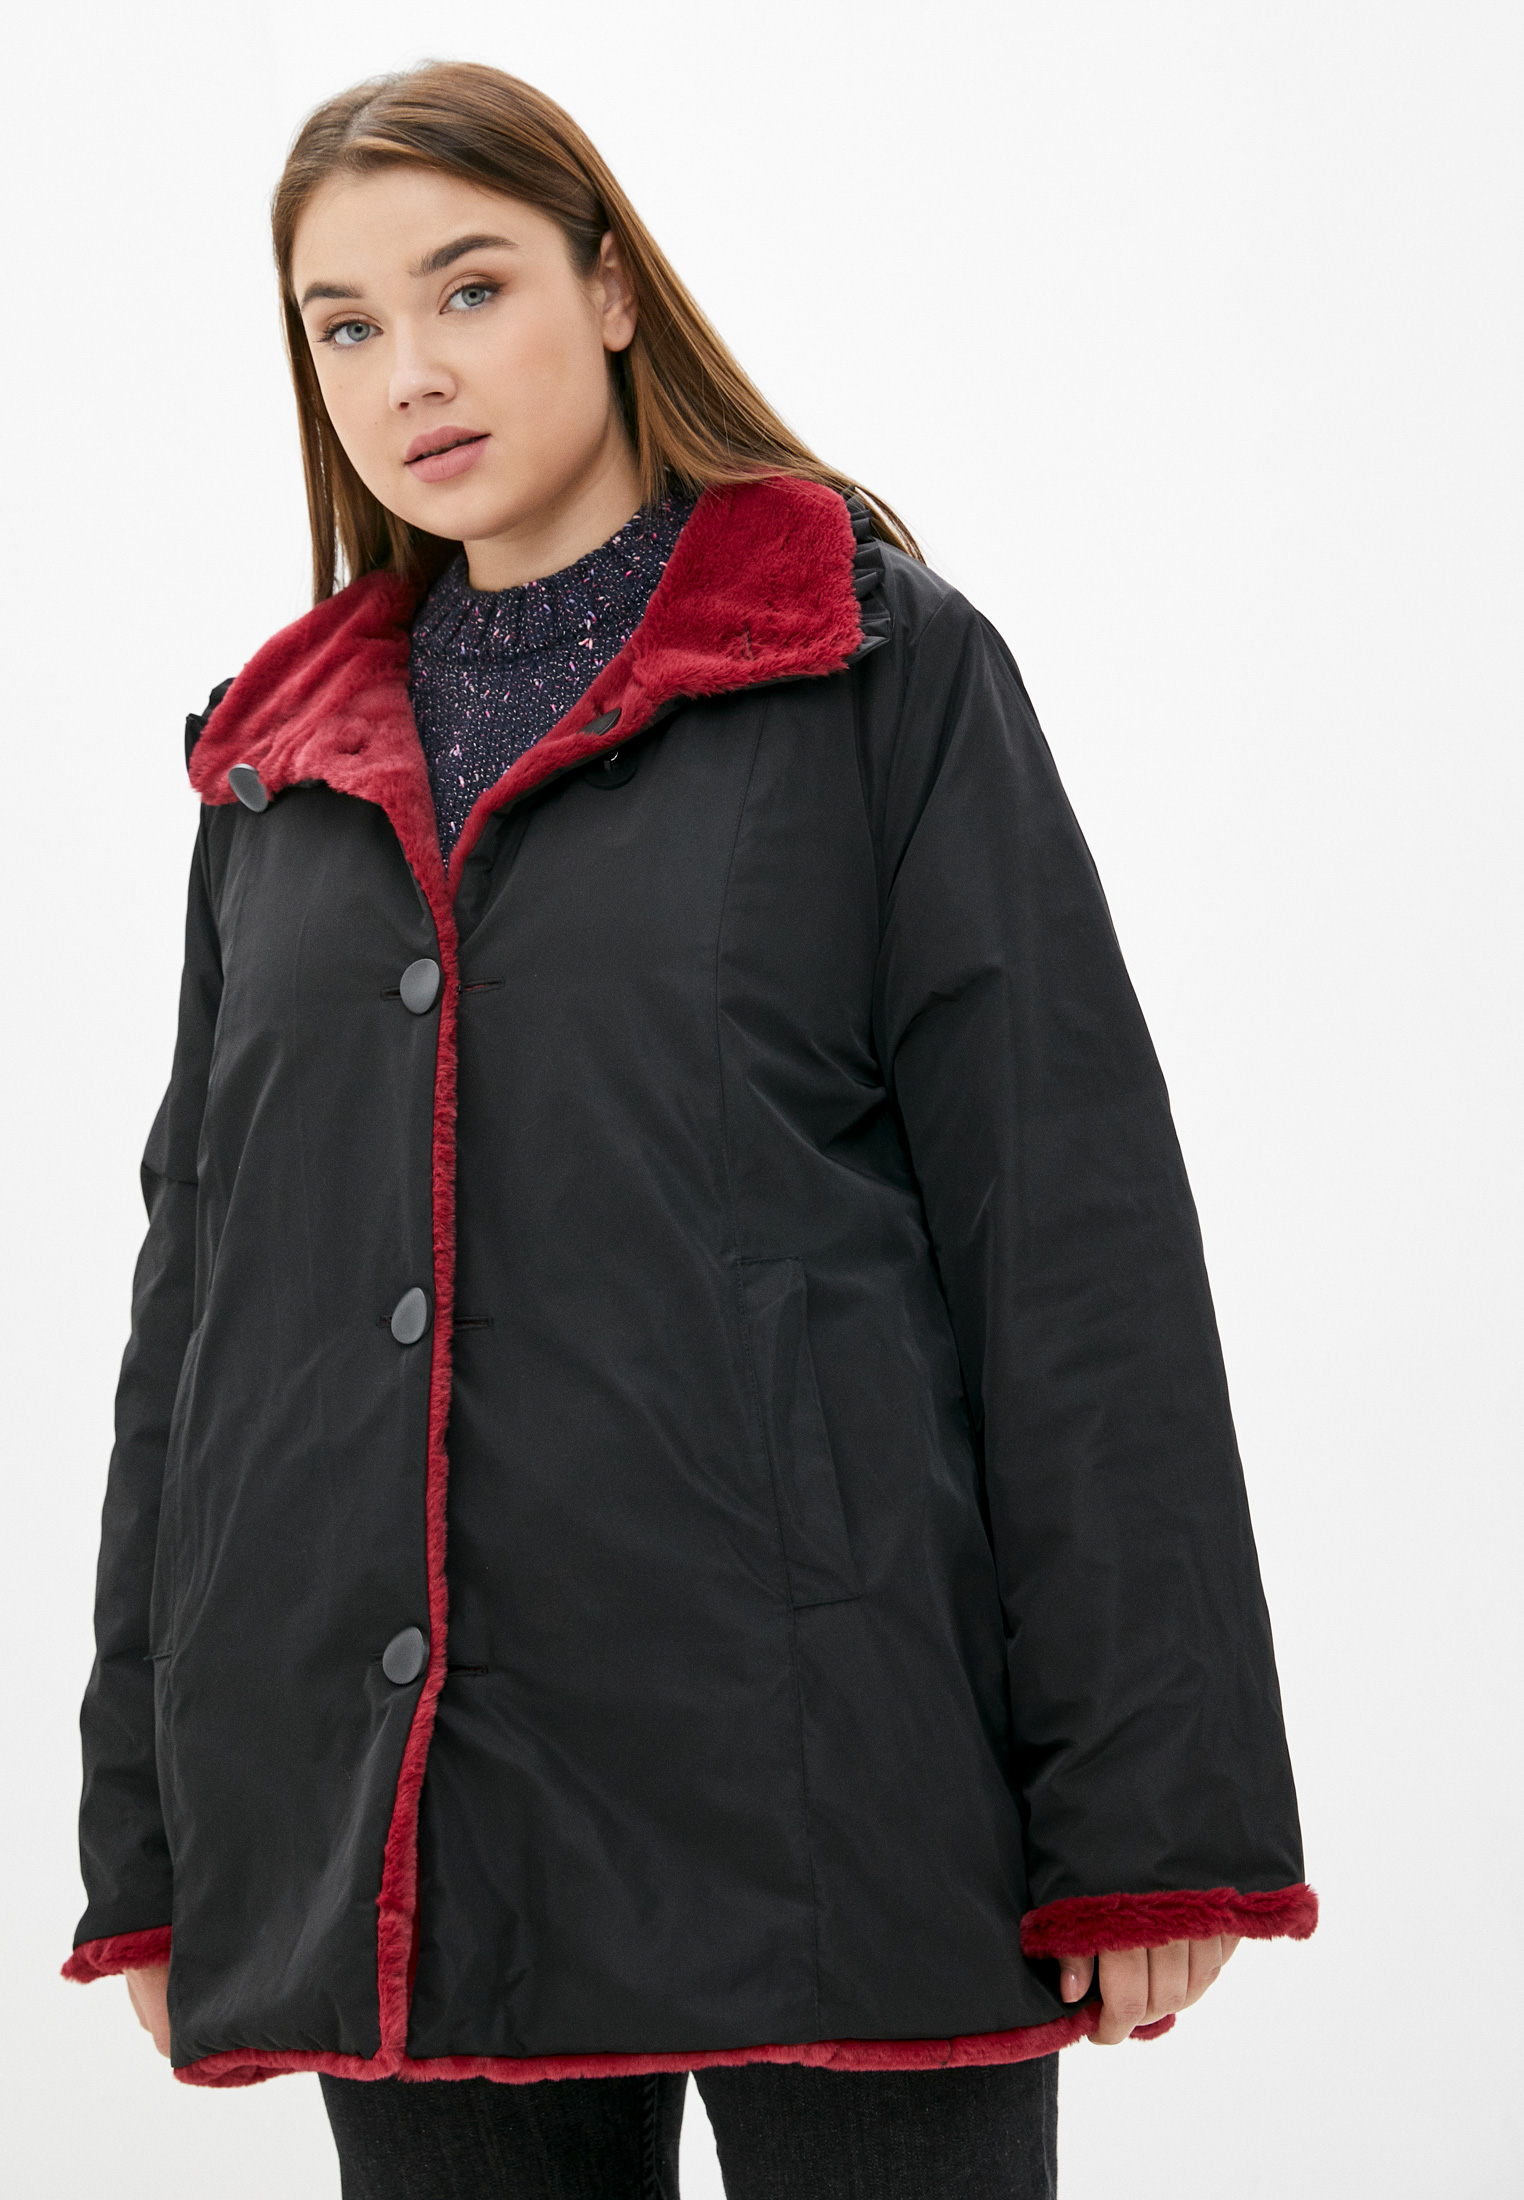 Утепленная куртка Sophia Куртка утепленная Sophia